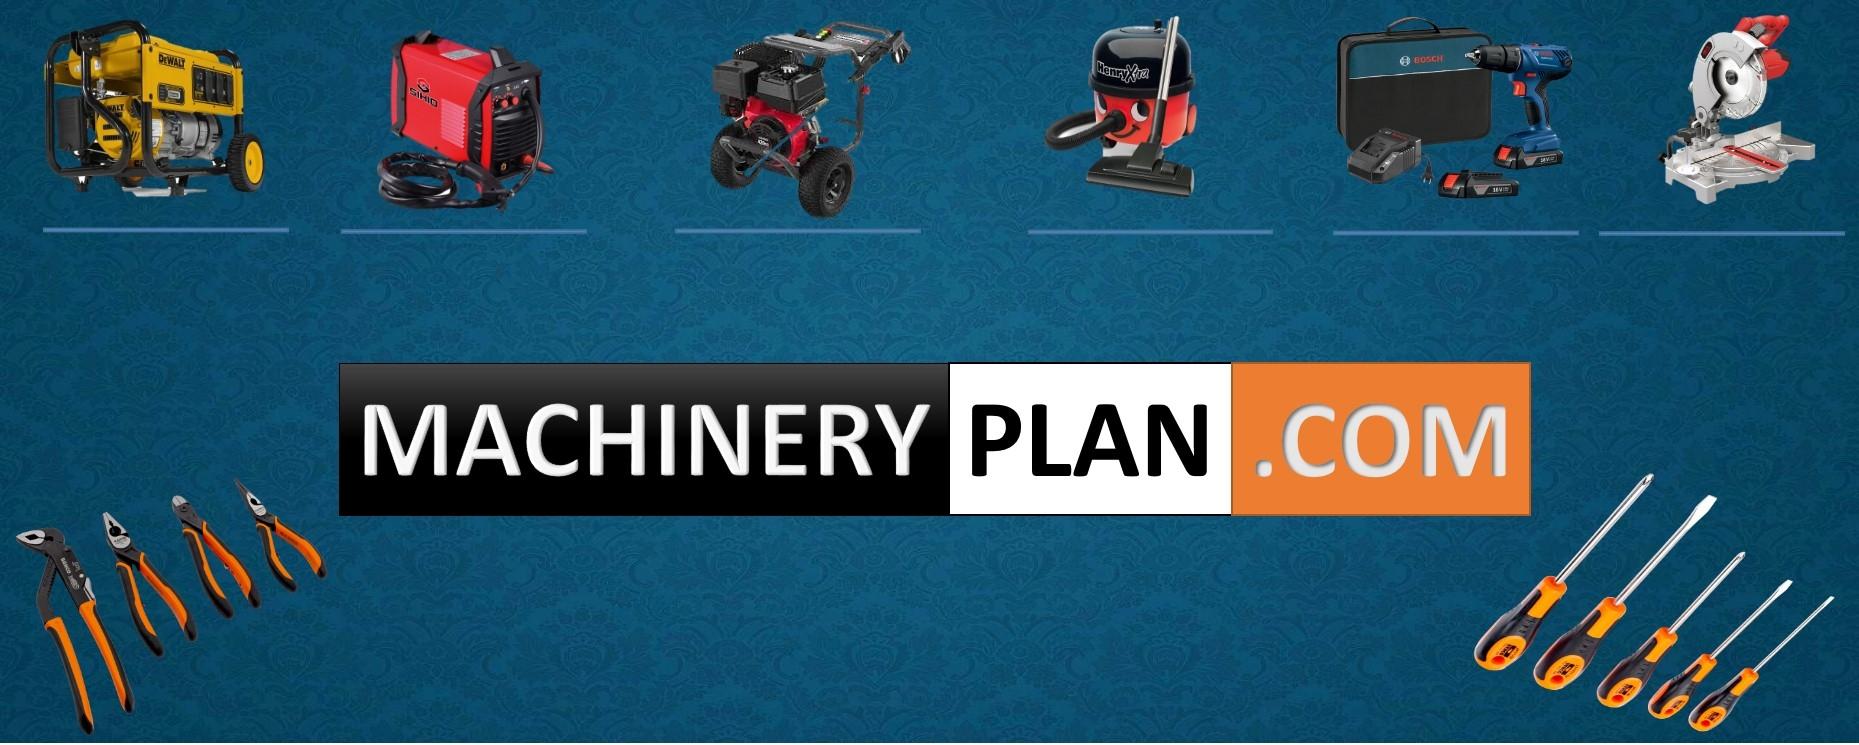 Machinery Plan (@machineryplan) Cover Image